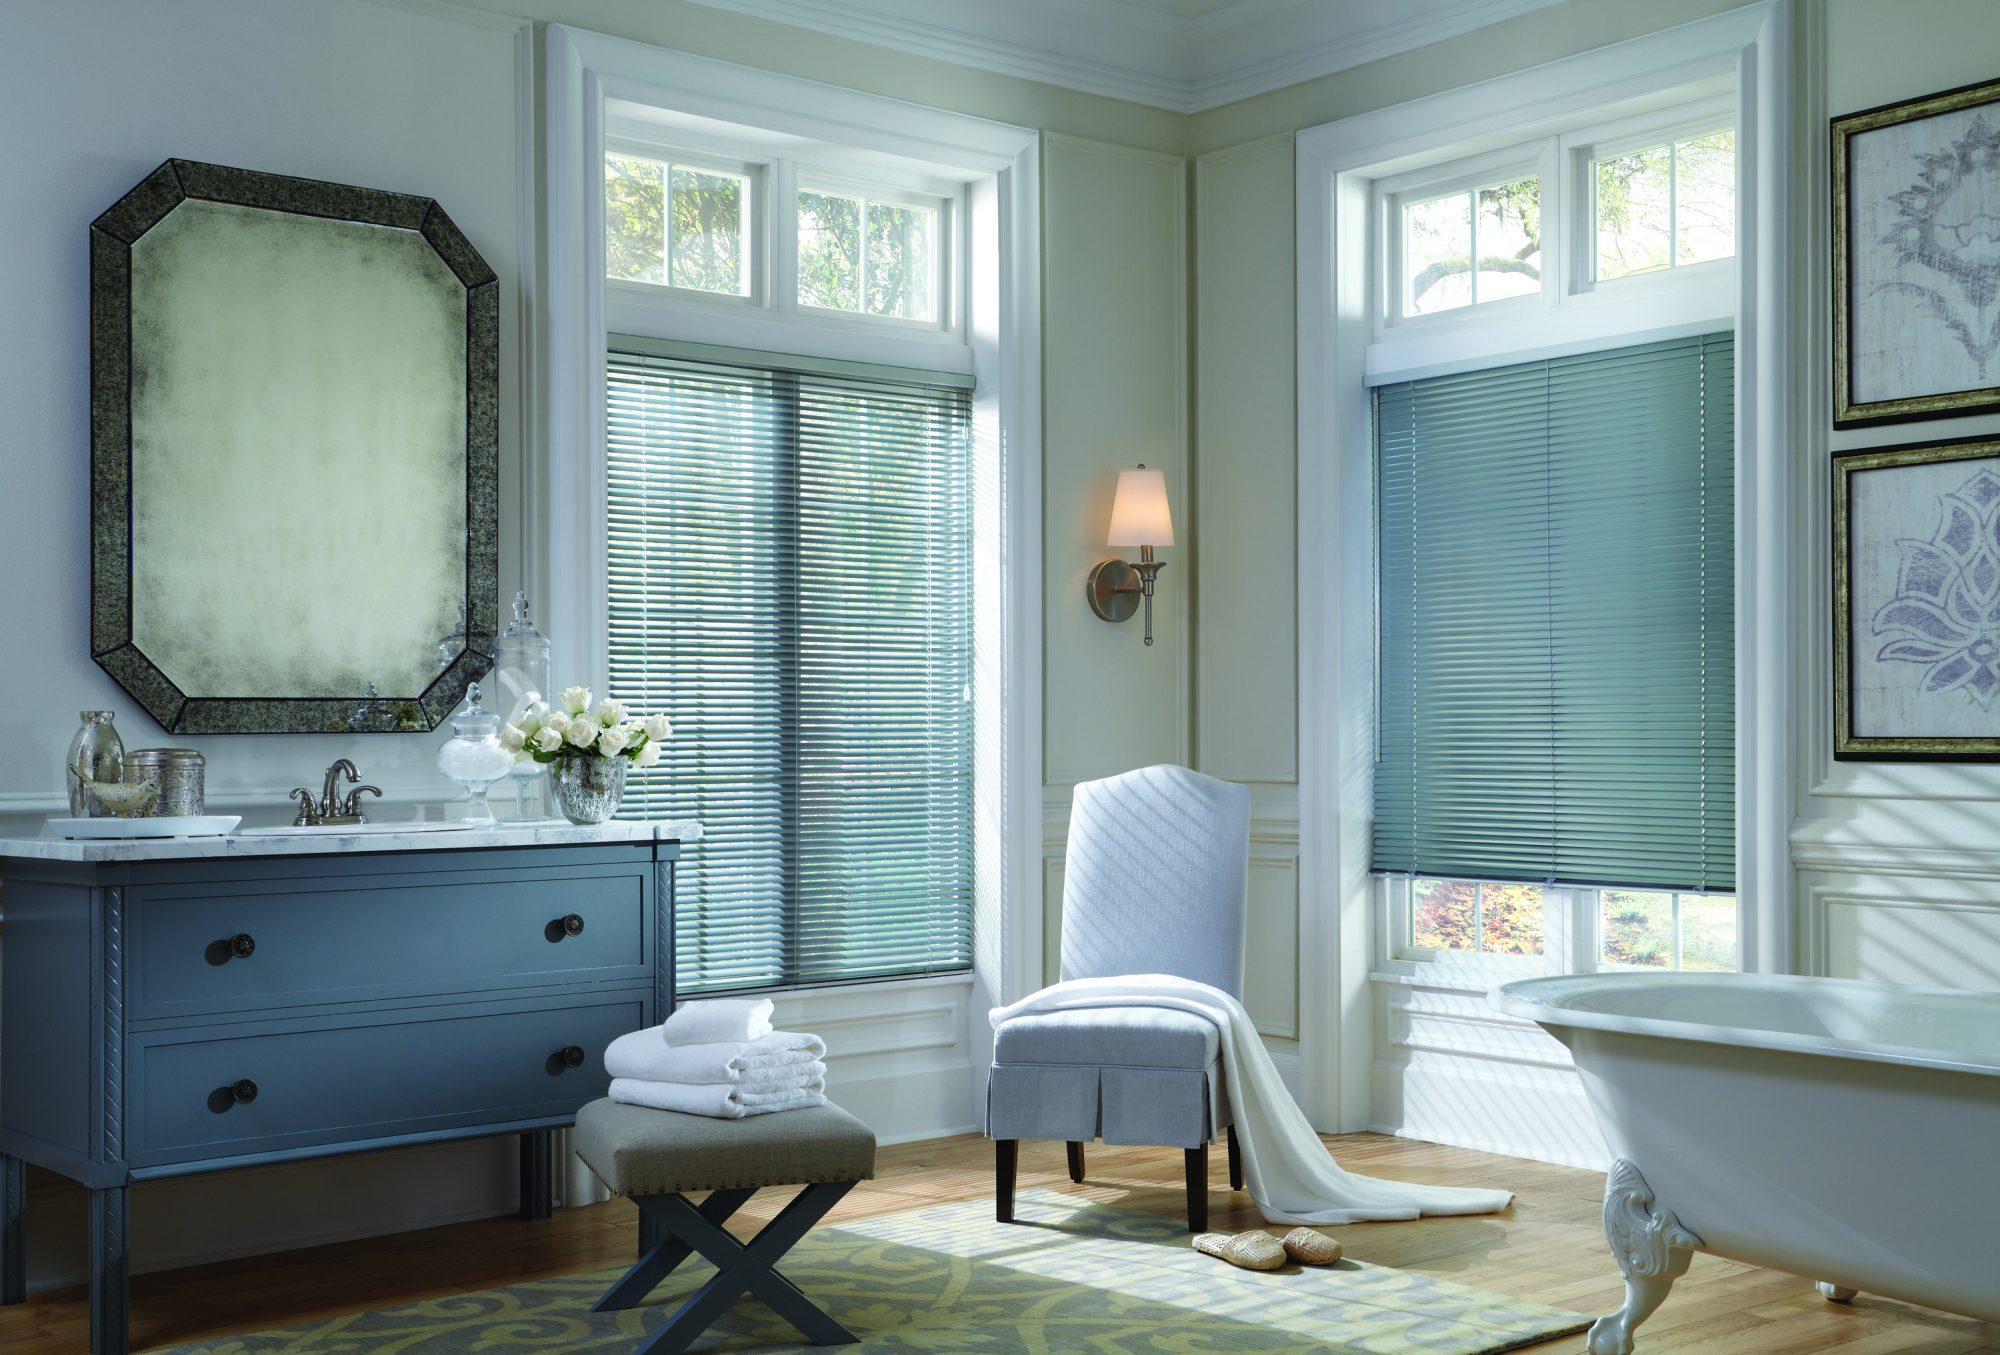 2014_MPM_Standard Cordlock_Aluminum Blinds_Bathroom